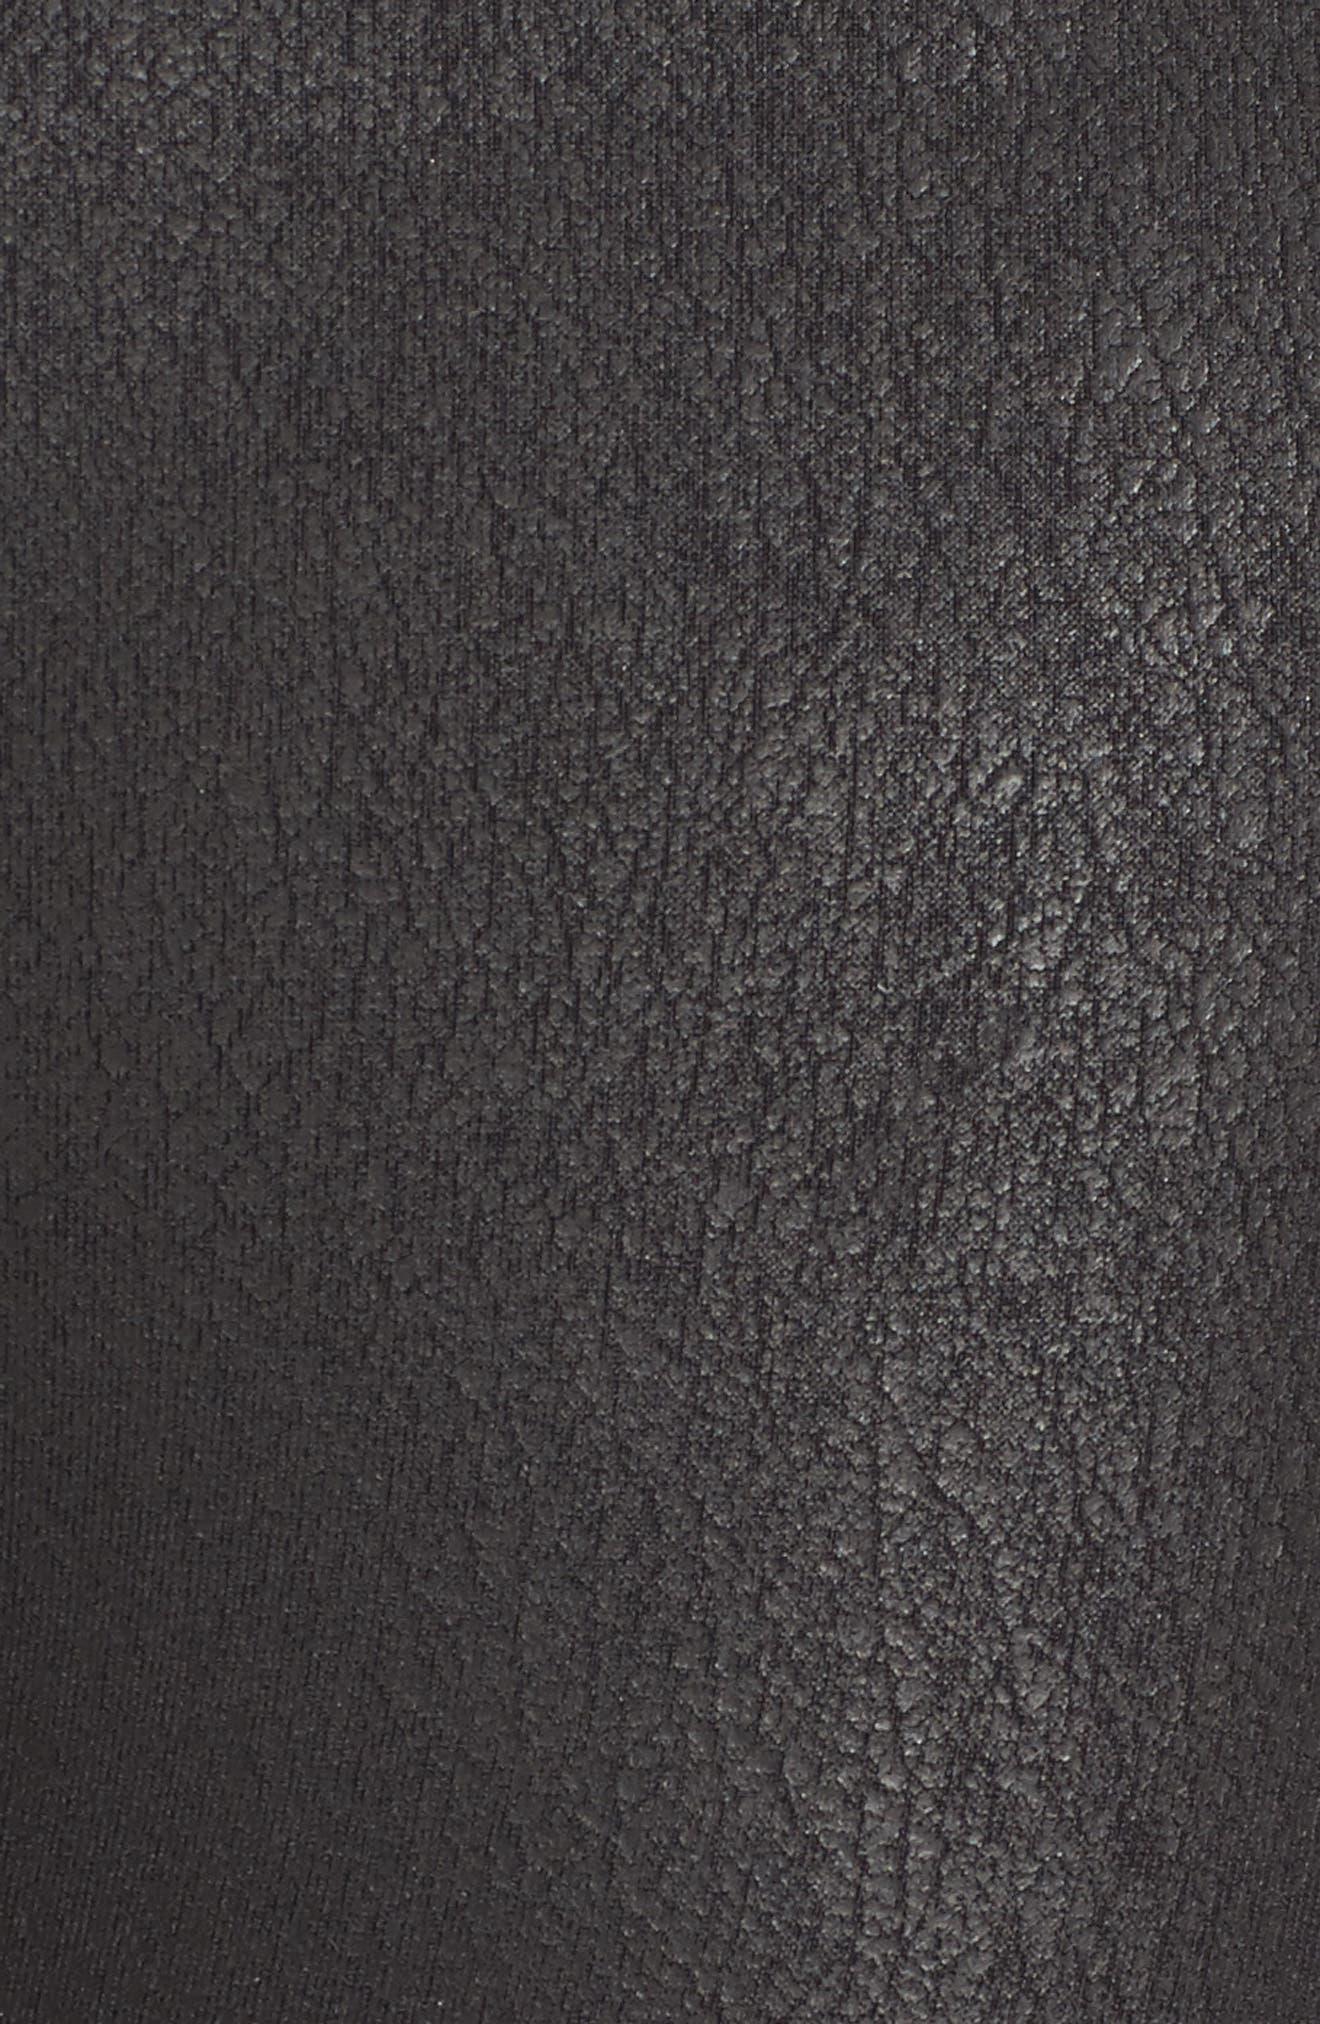 High Waist Moto Leggings,                             Alternate thumbnail 6, color,                             BLACK PERFORMANCE LEATHER